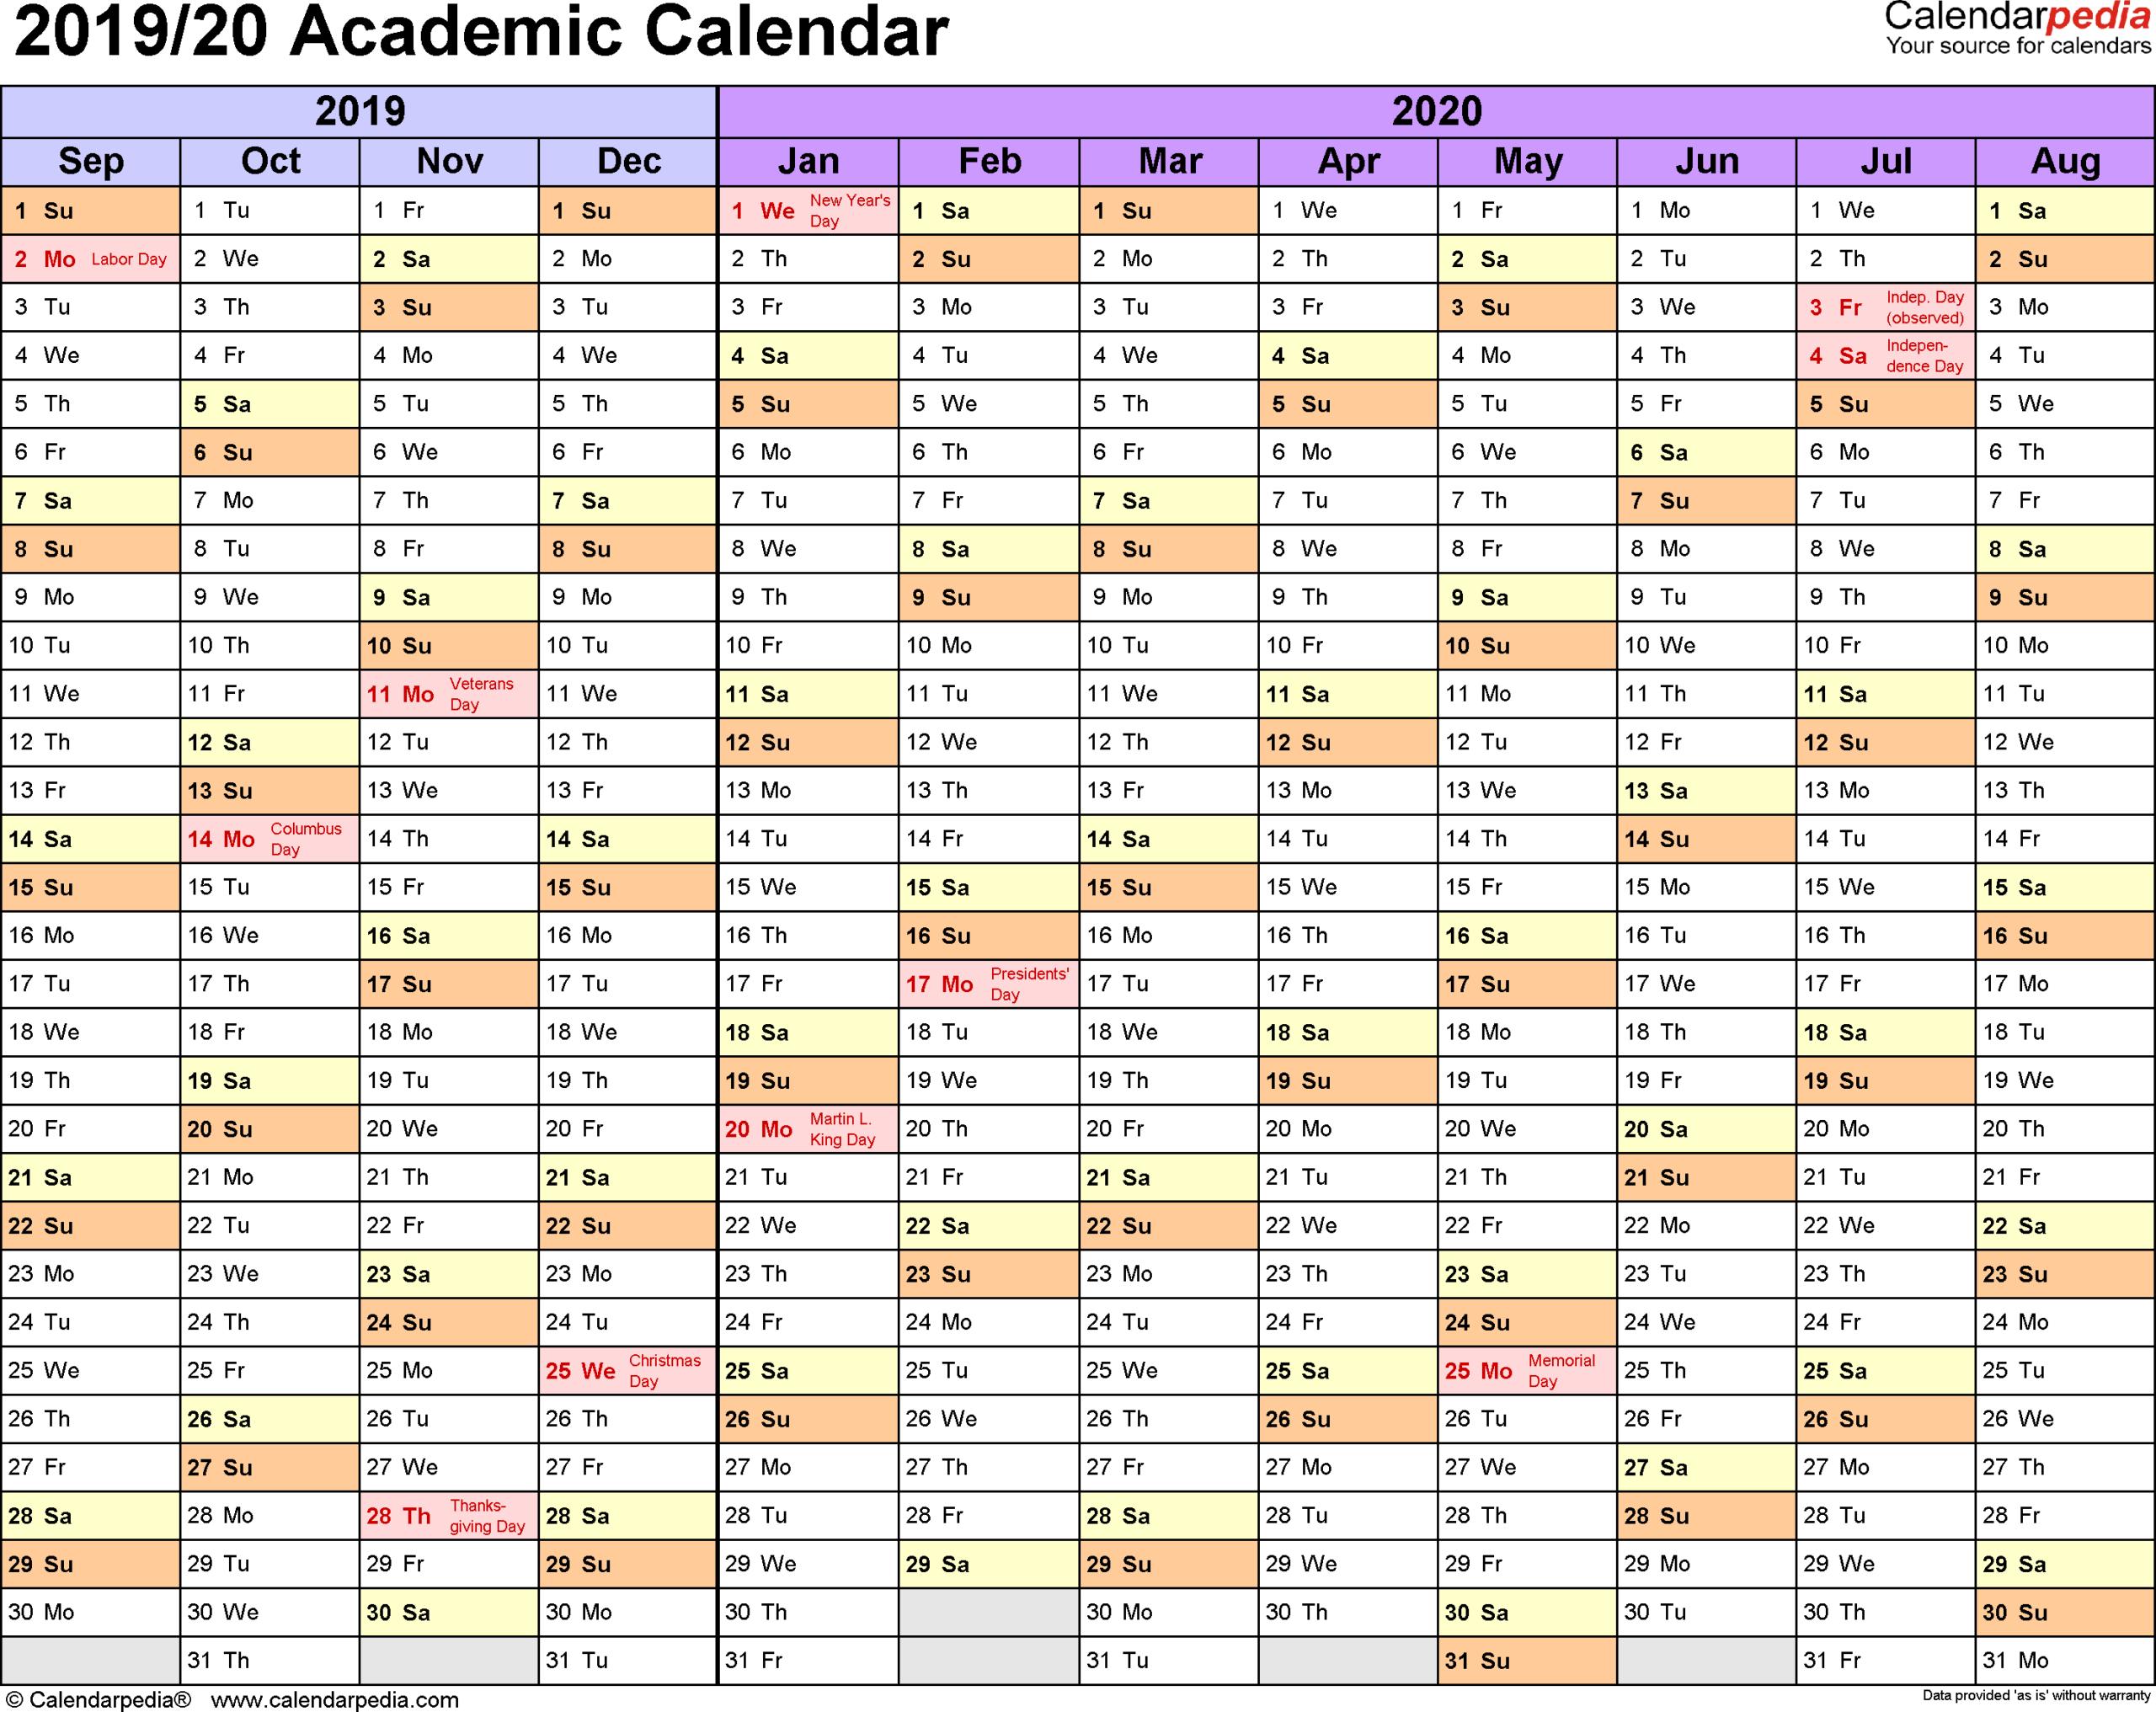 Free Blank Printable Calendar 2019 With Holidays Template throughout Vertex Academic Calendar